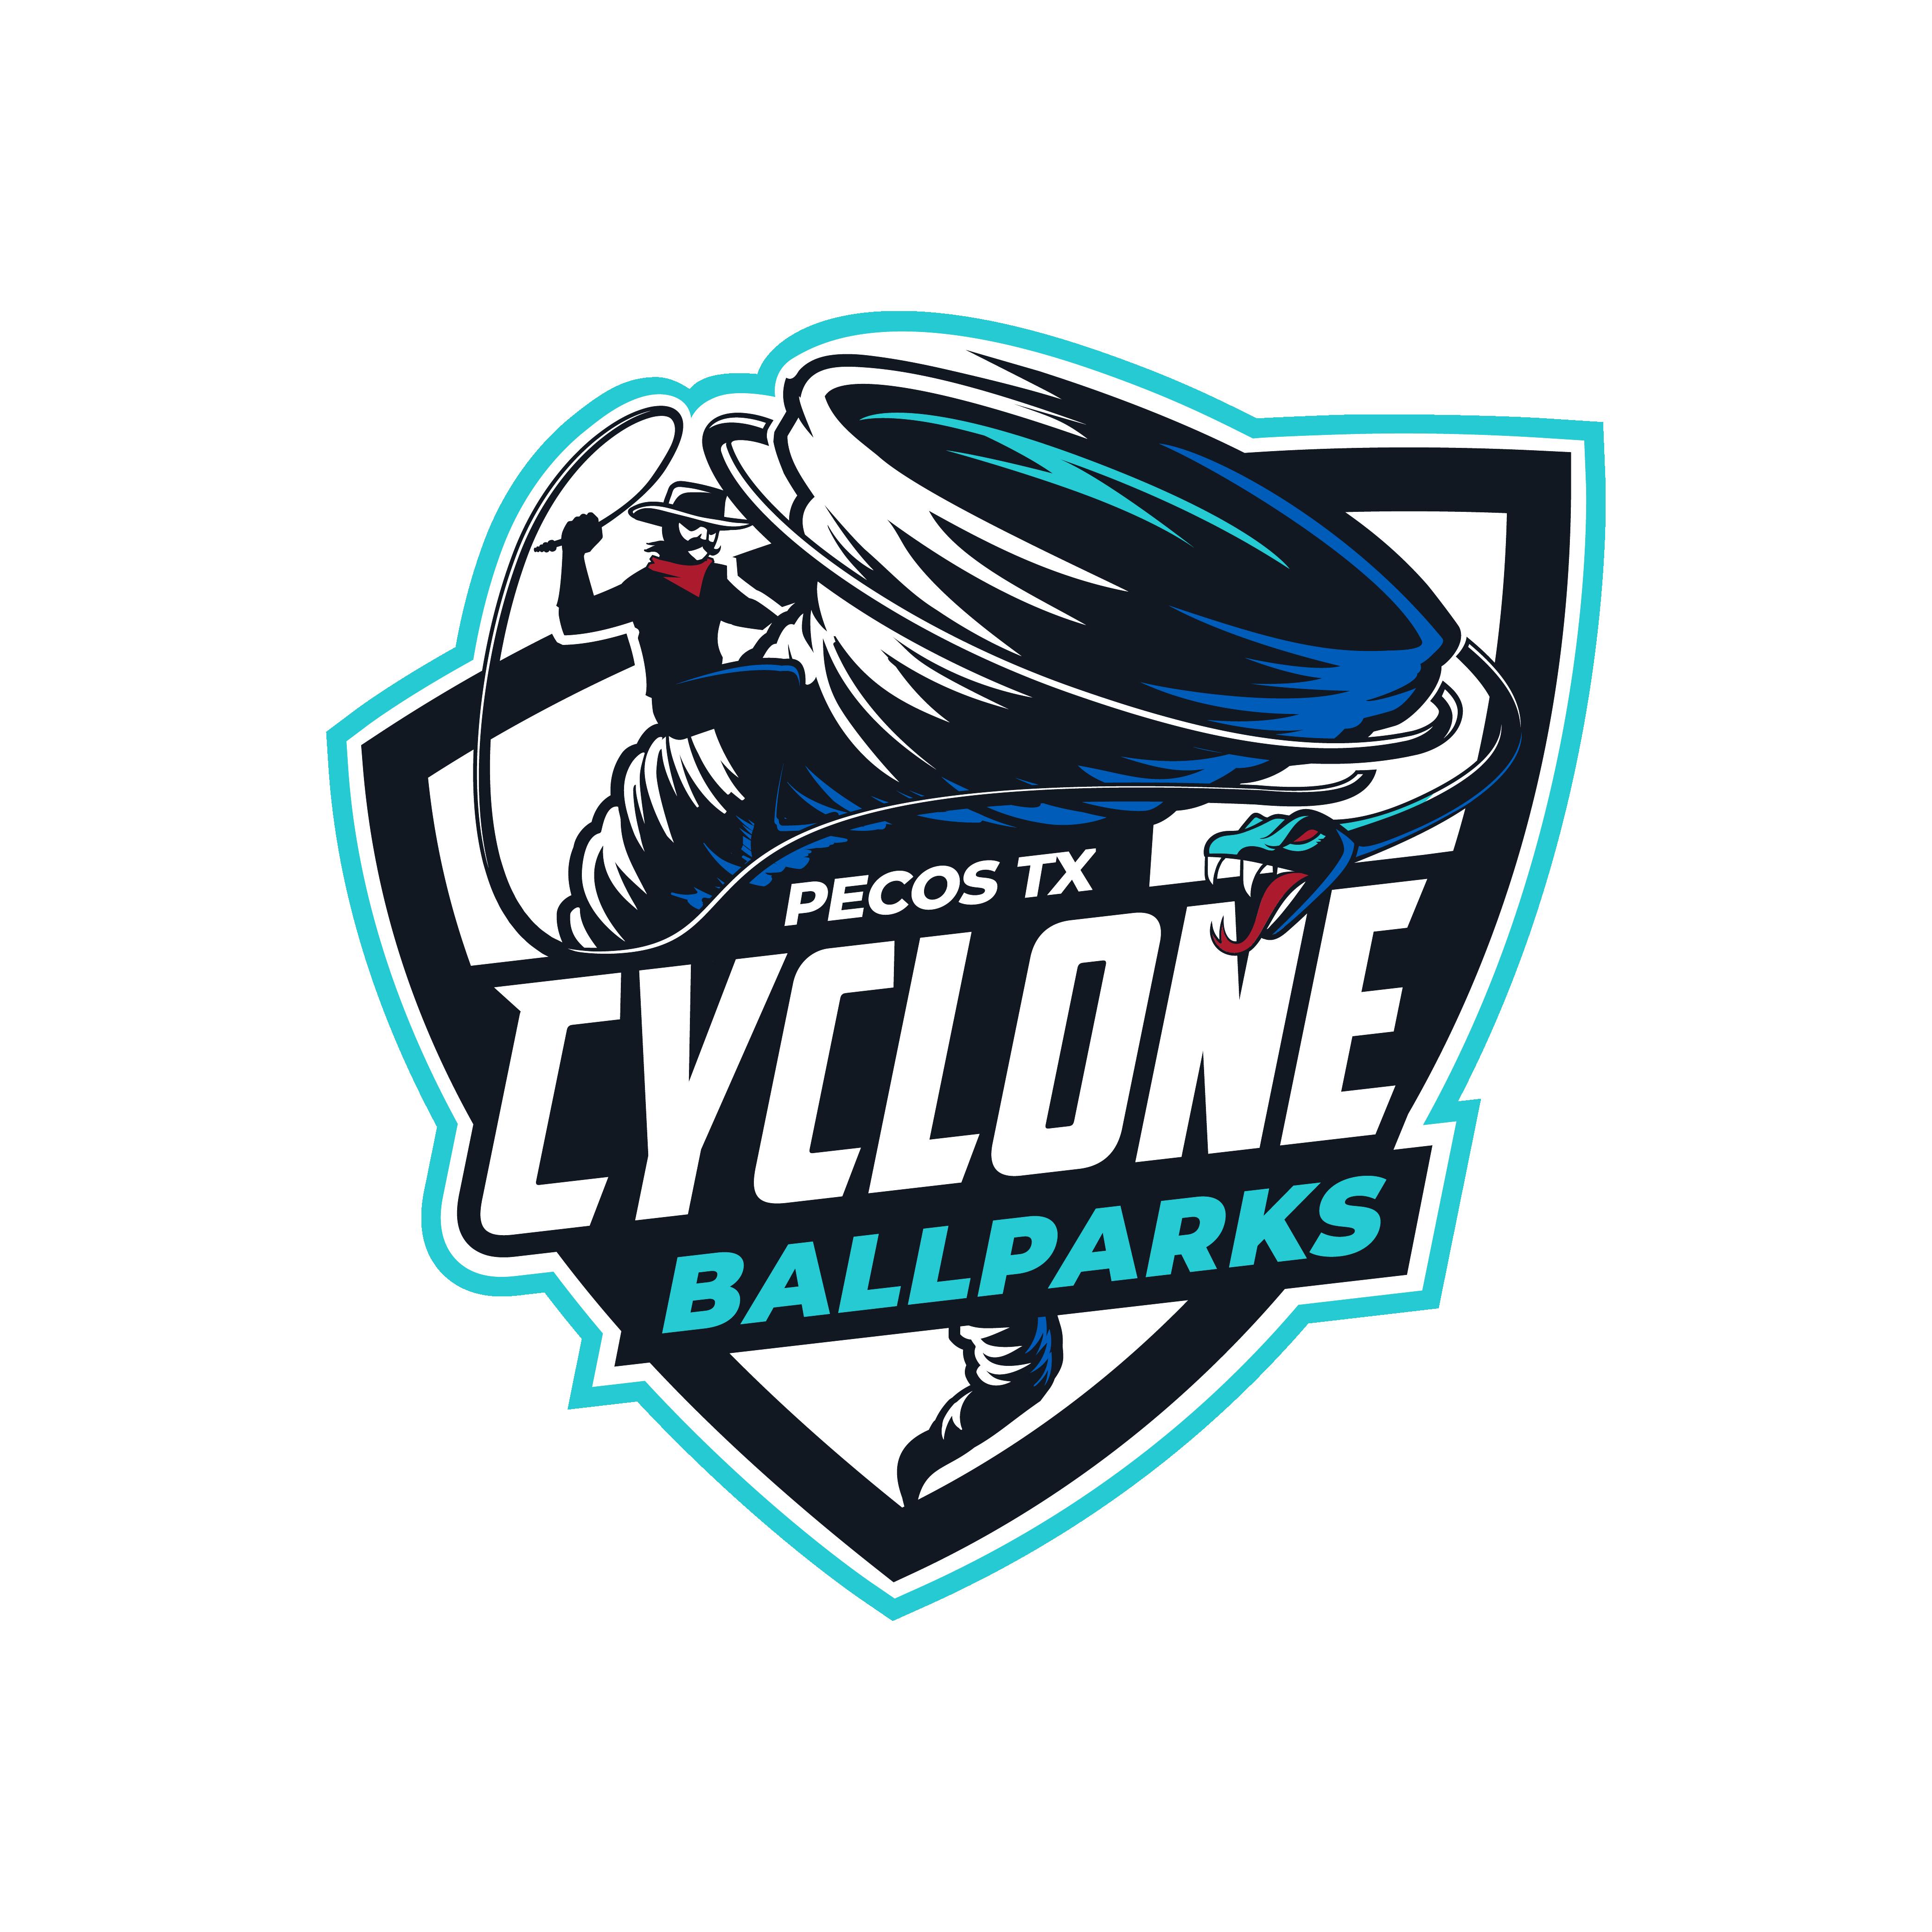 Cyclone Ballparks